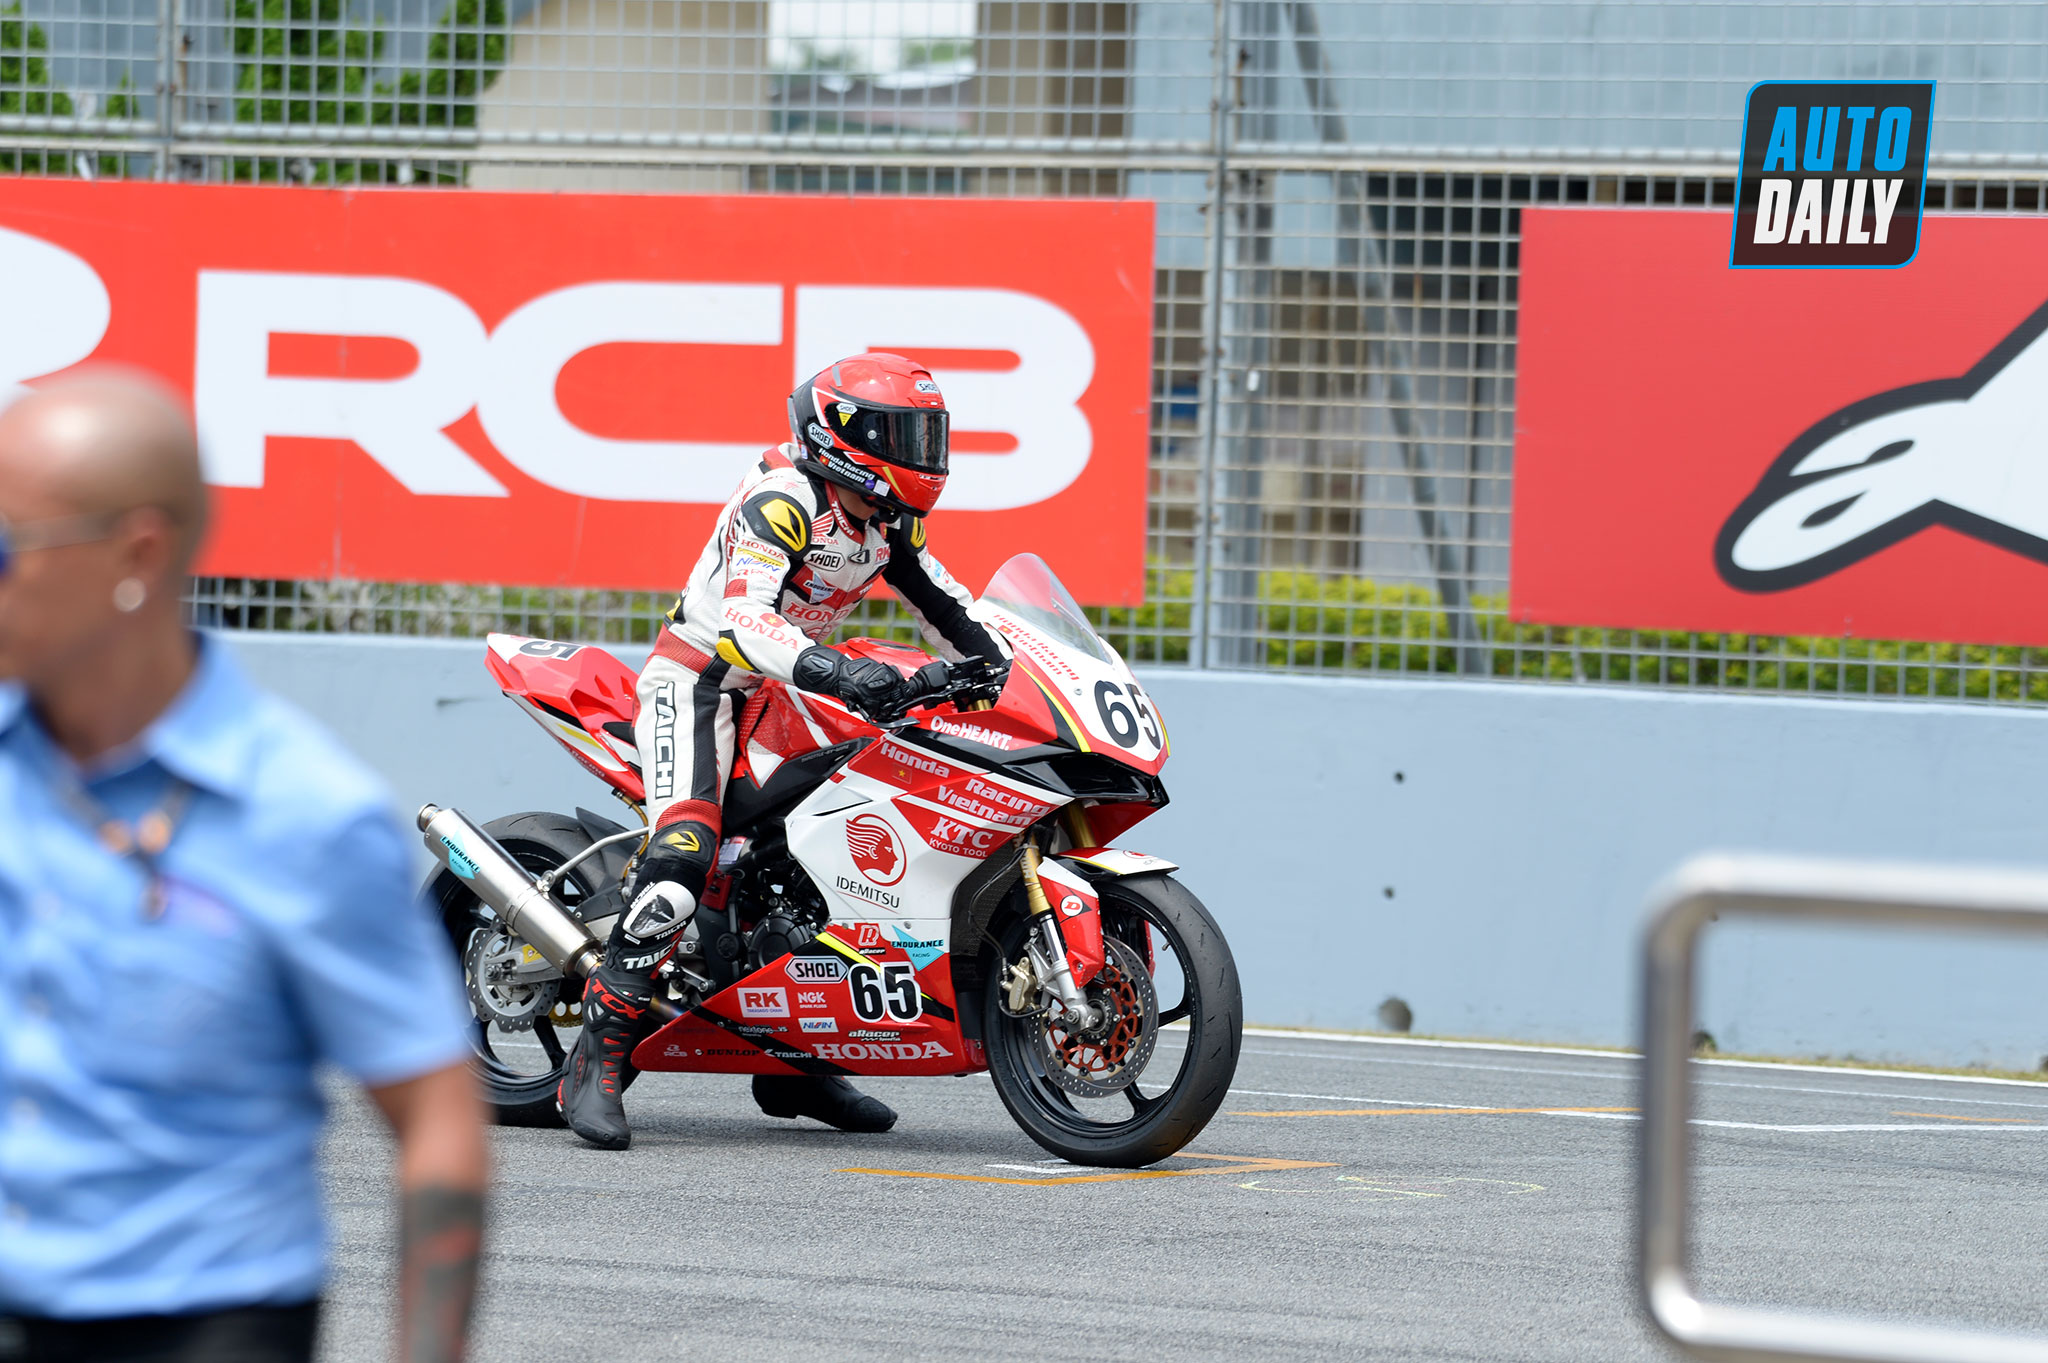 race1-1.jpg